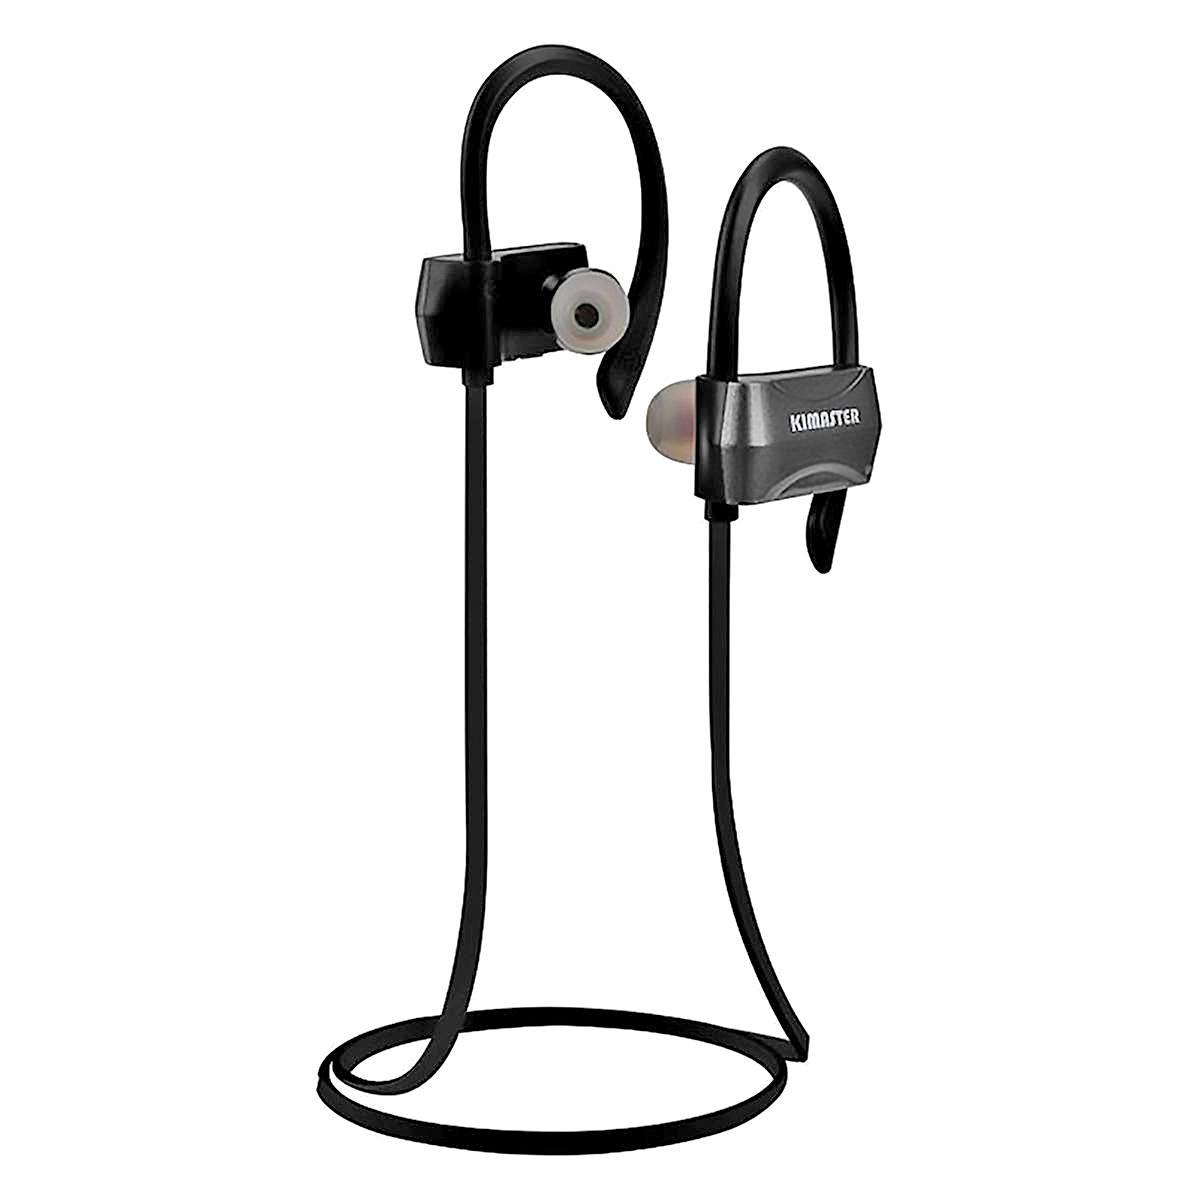 Fone Esportivo Bluetooth 5.0 Wireless Smart Stereo Sports com Áudio HD e Microfone Kimaster K30